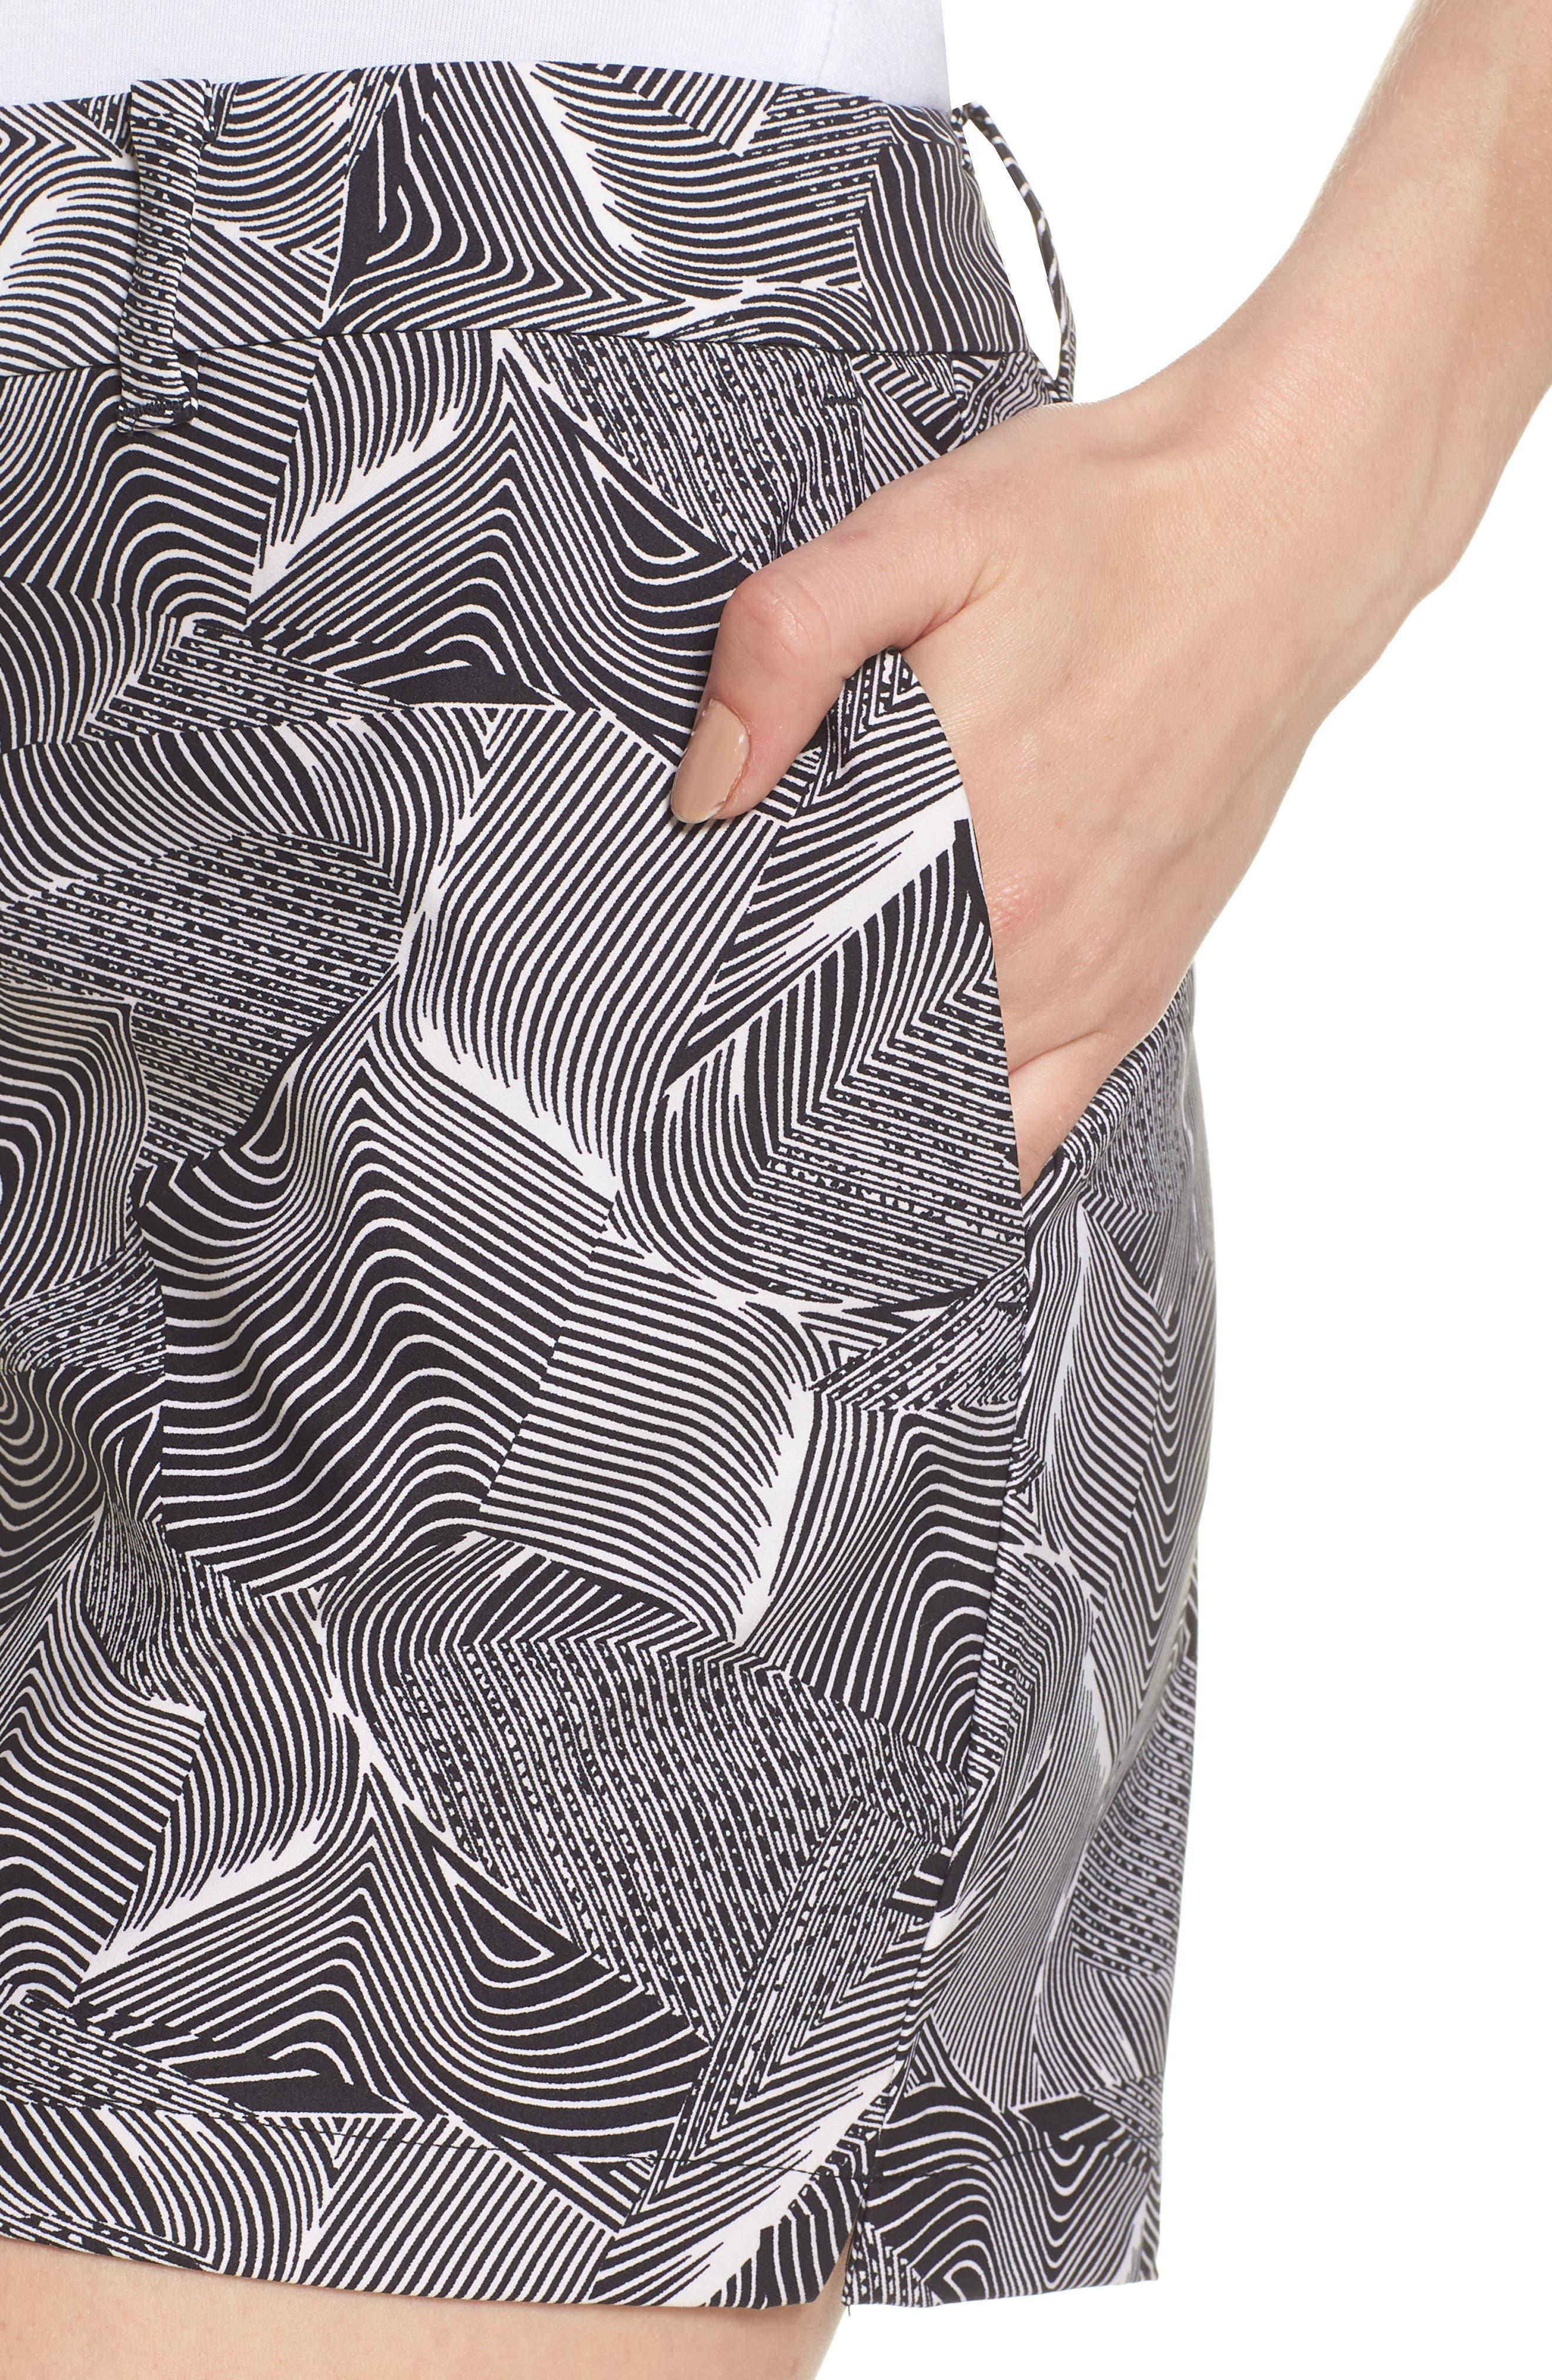 Flex Golf Shorts,                             Alternate thumbnail 4, color,                             White/ Black/ White